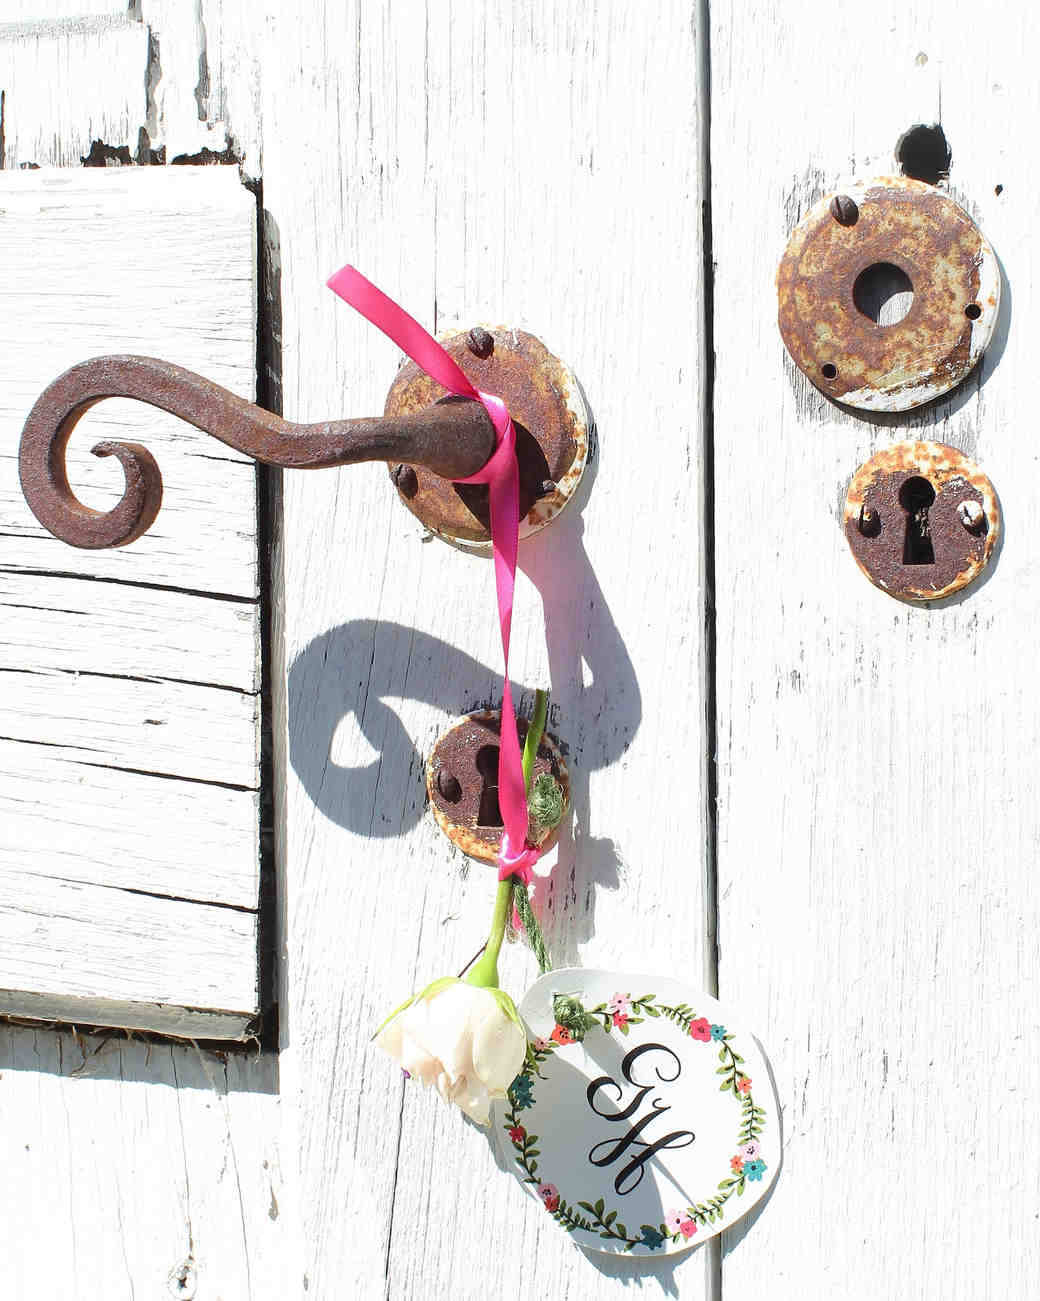 geri-hirsch-bridal-shower-tea-party-doorknob-ribbon-0315.jpg